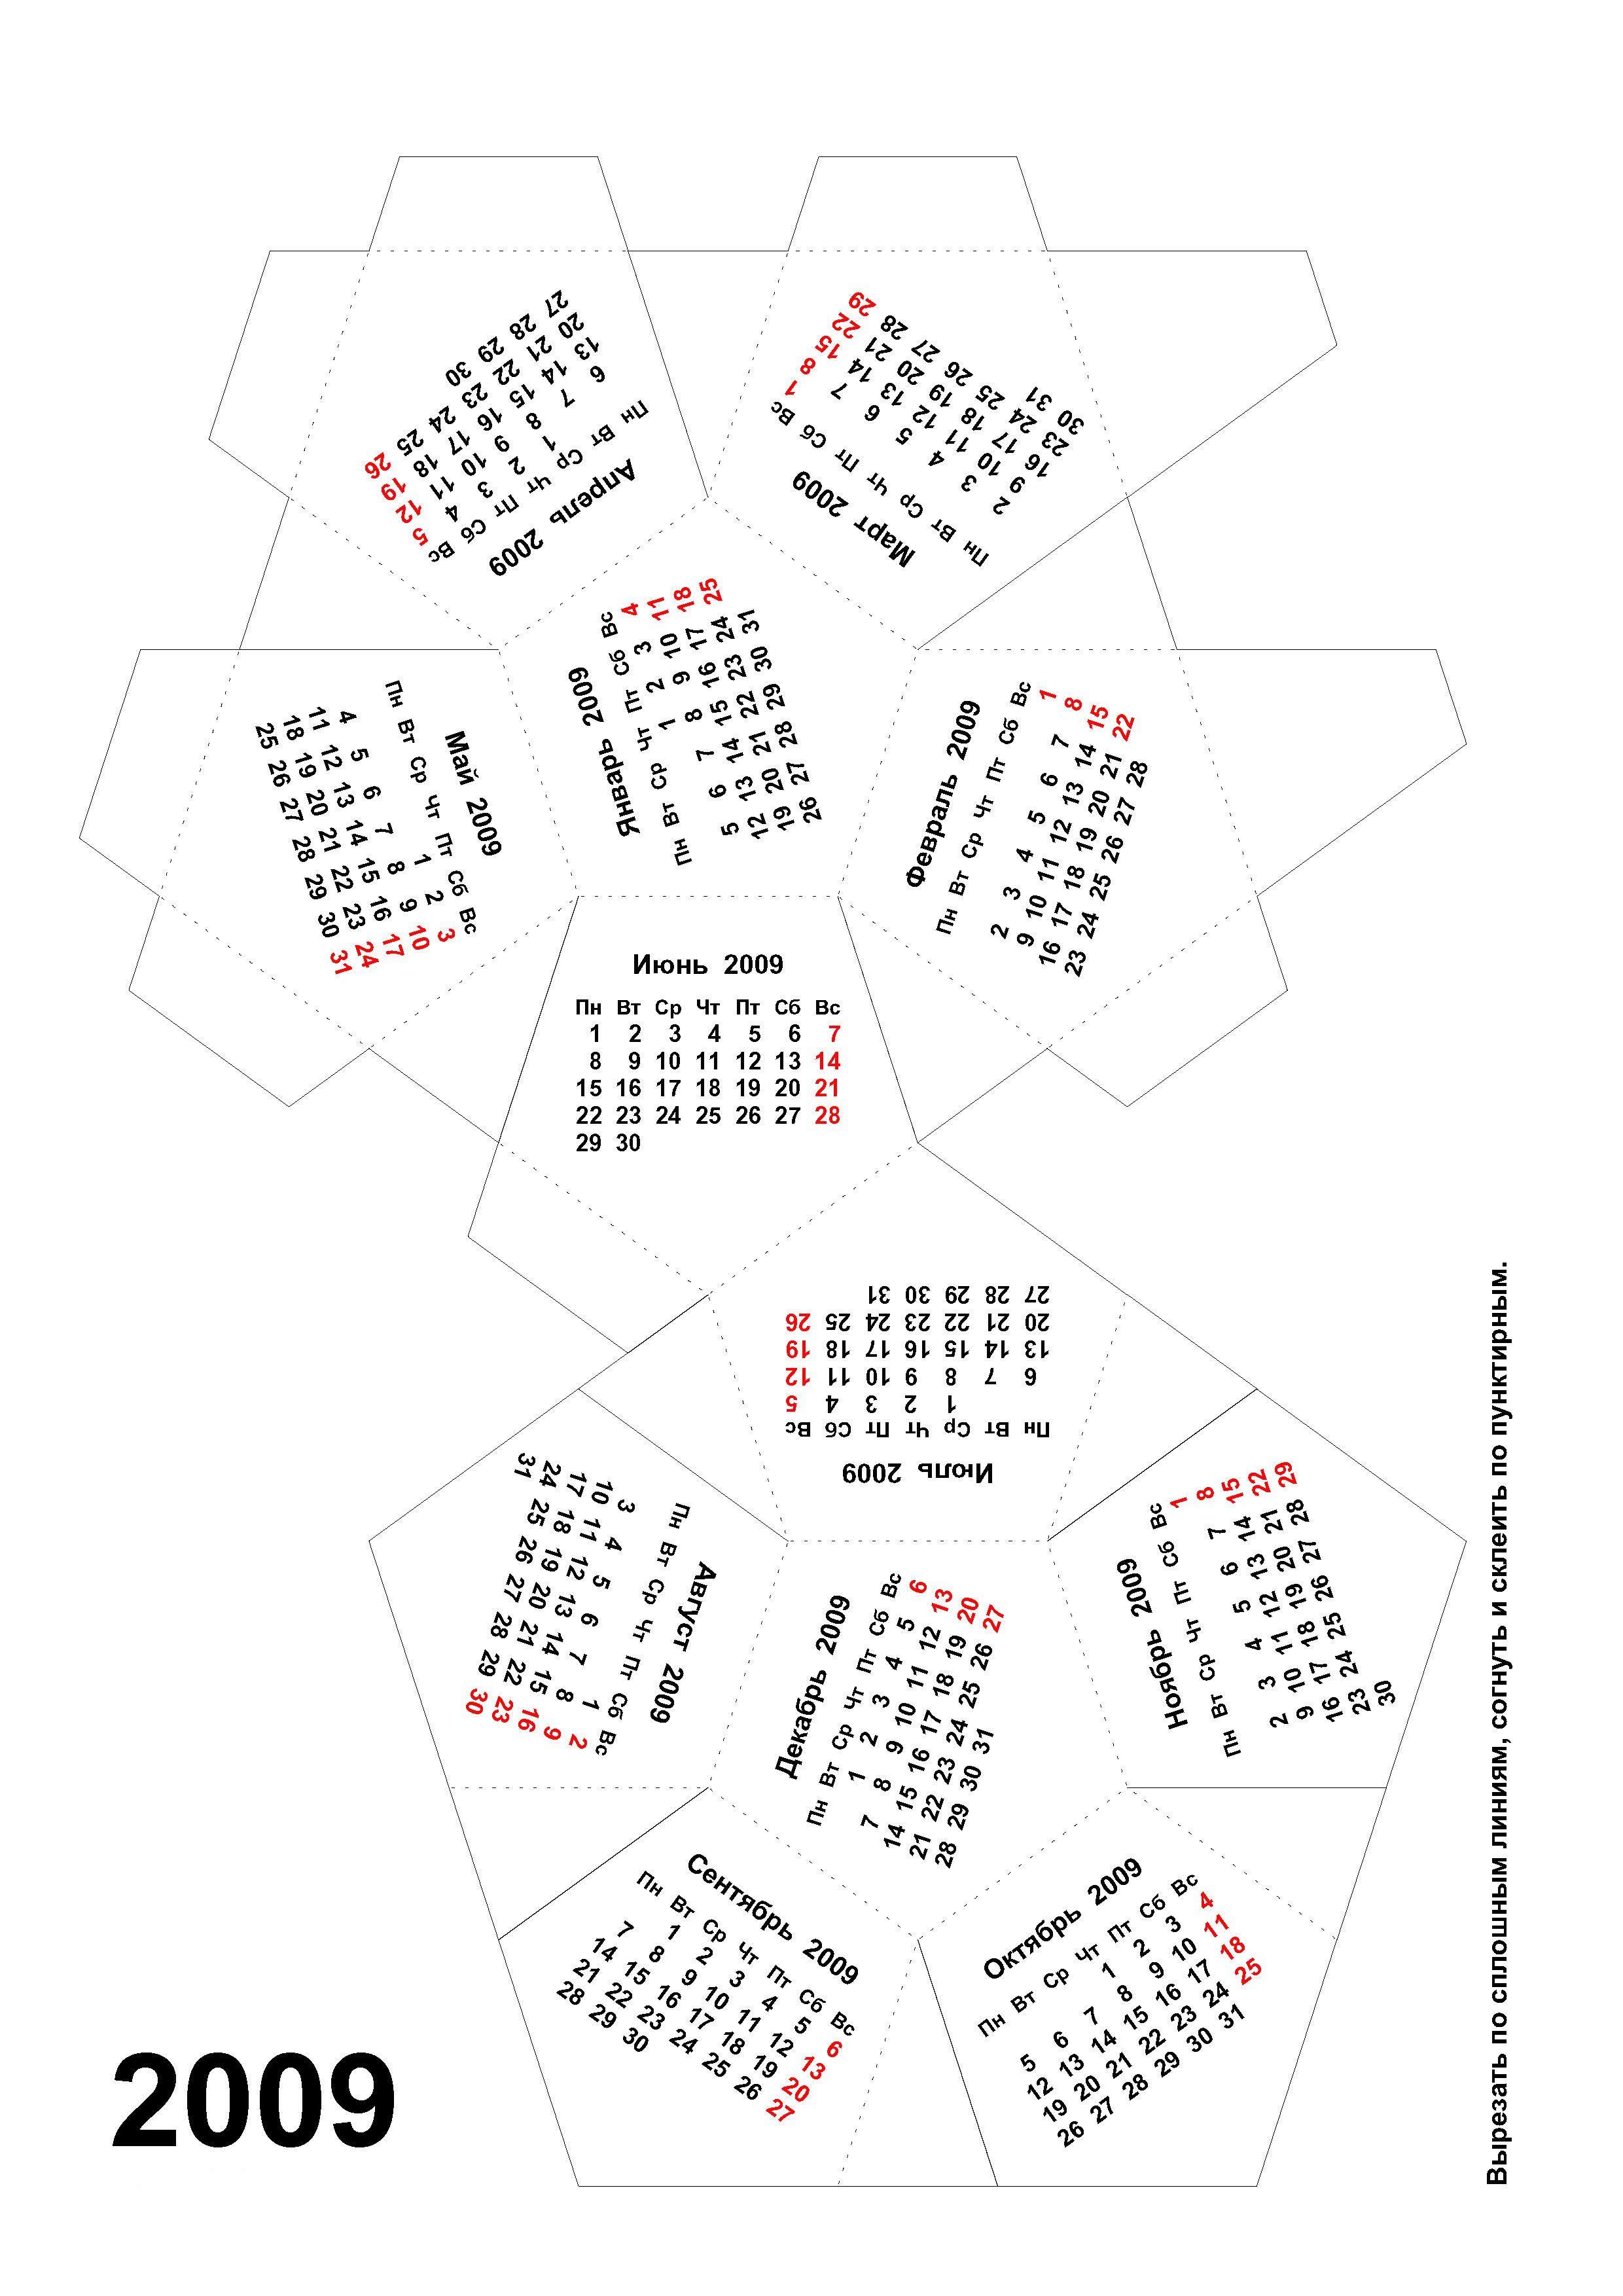 Рисунки календарей своими руками